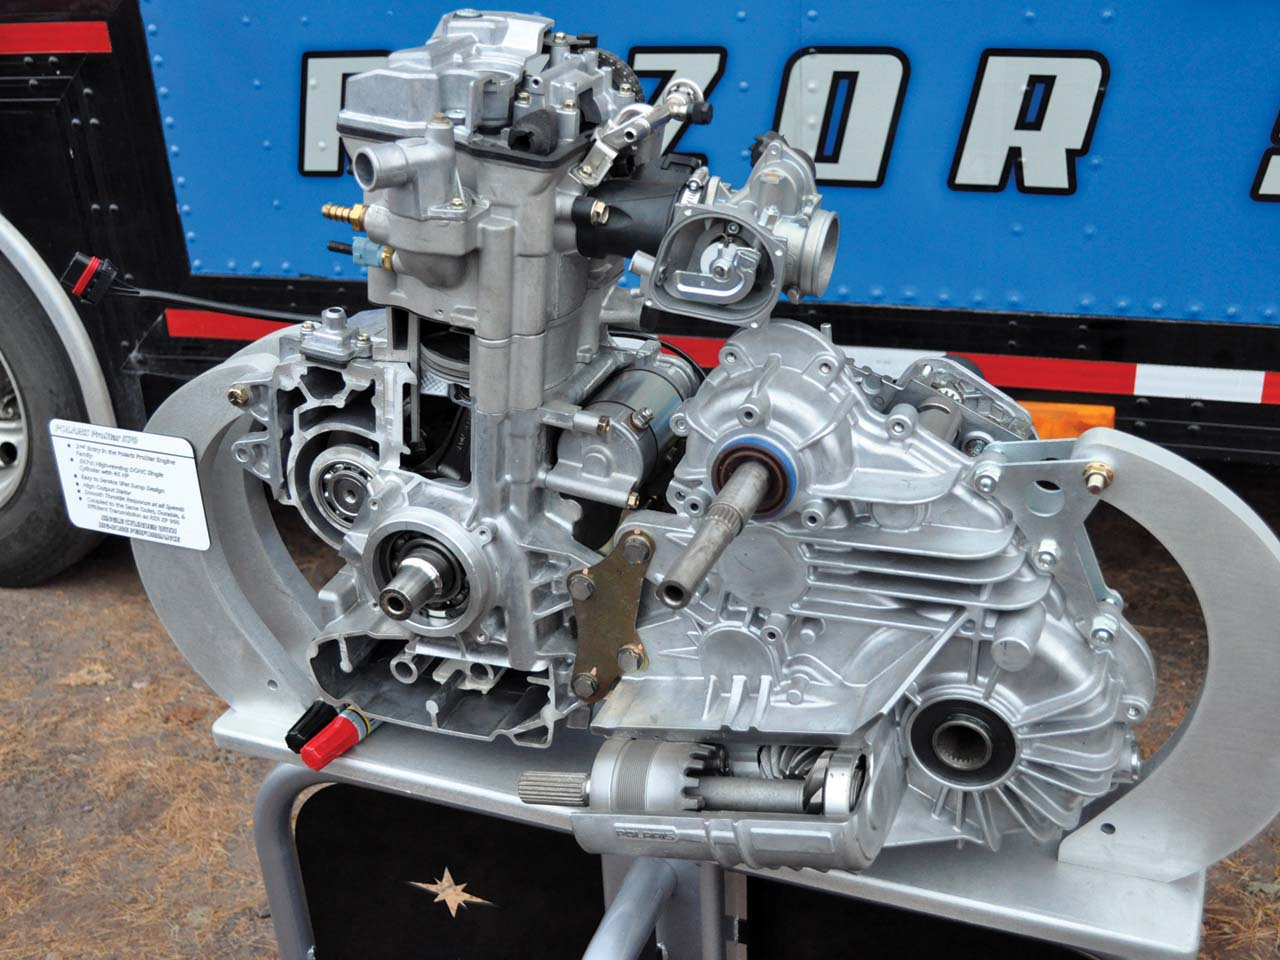 hight resolution of polaris rzr 570 motor diagram wiring diagram paper polaris rzr 800 engine diagram